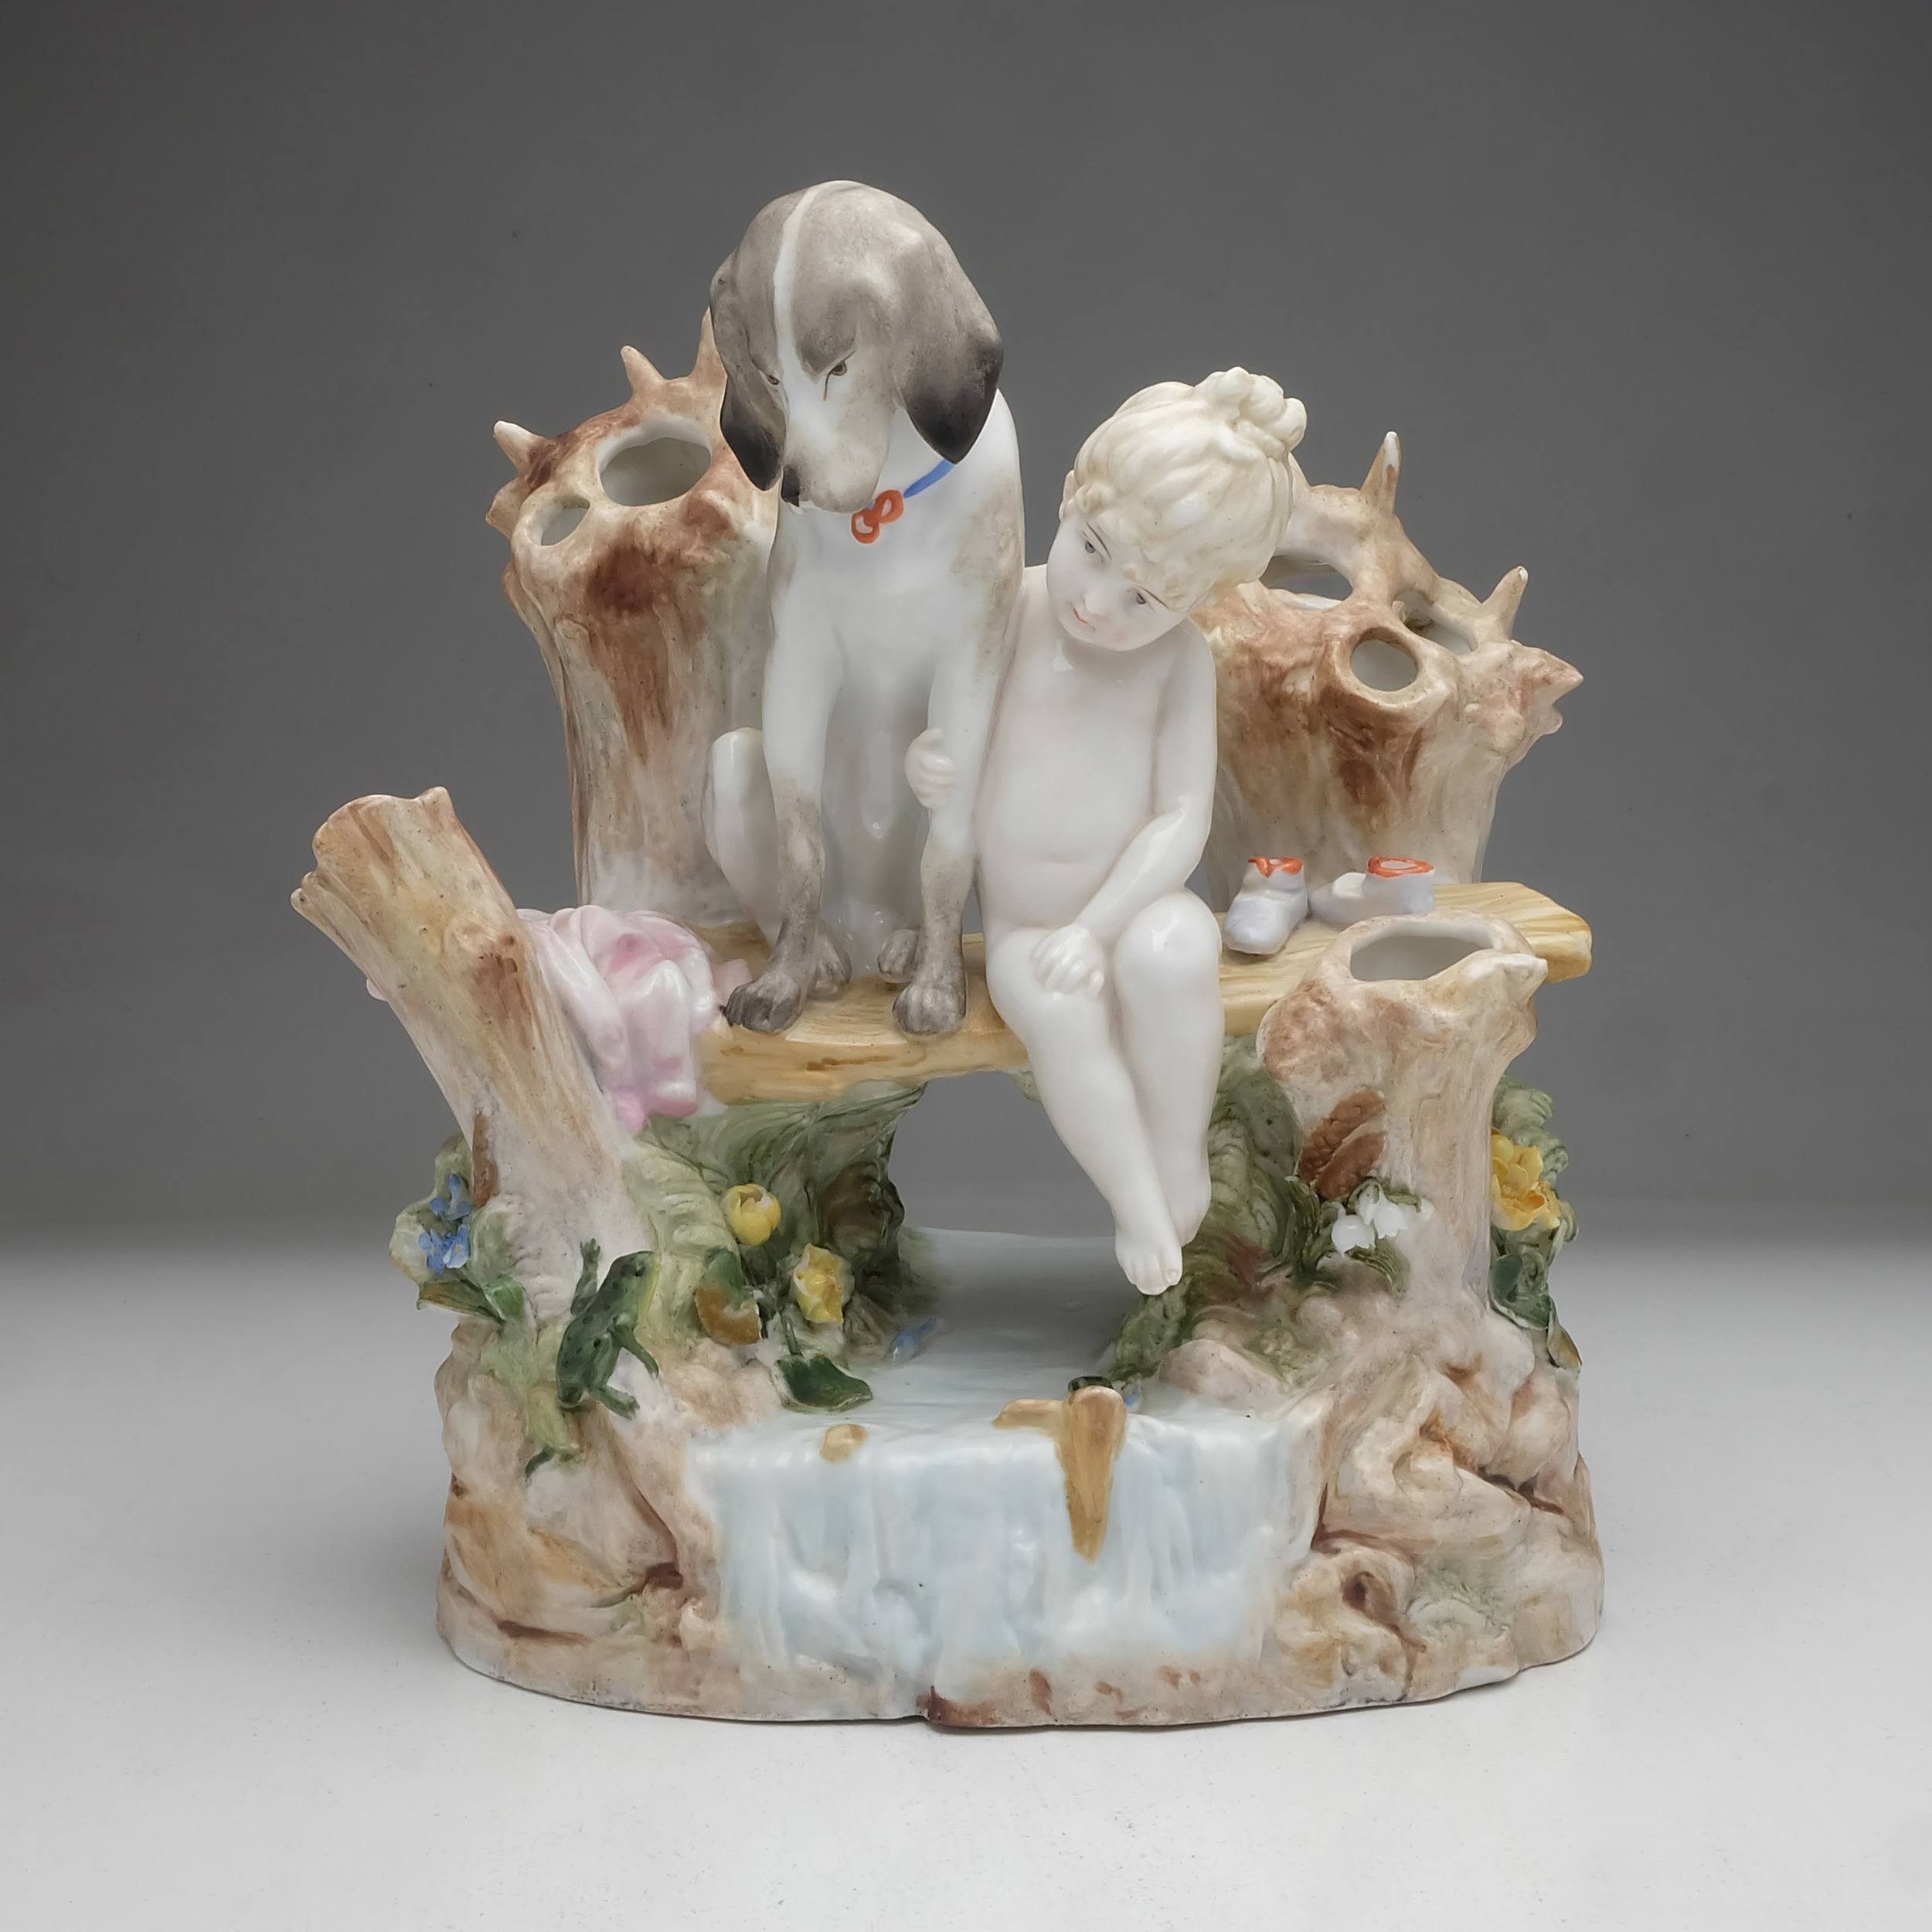 'German Königliche Porzellan-Manufaktur Porcelain Figure of Girl and Dog Sitting on a Bench over a Stream, 1123'